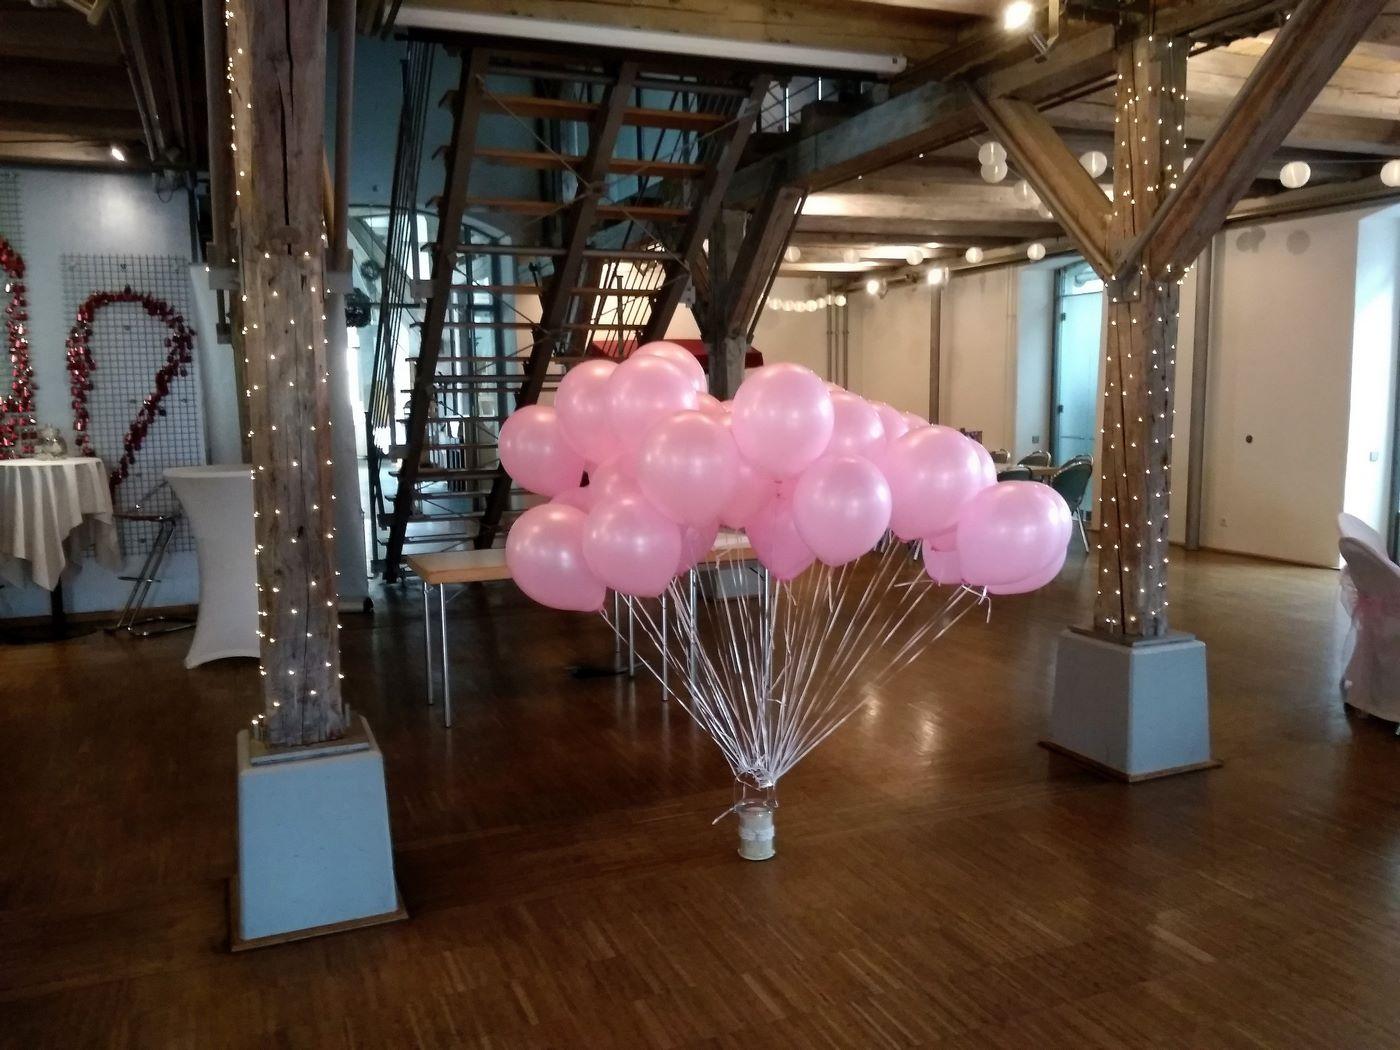 Rosa Heliumballons im Zollhaus Ludwigshafen